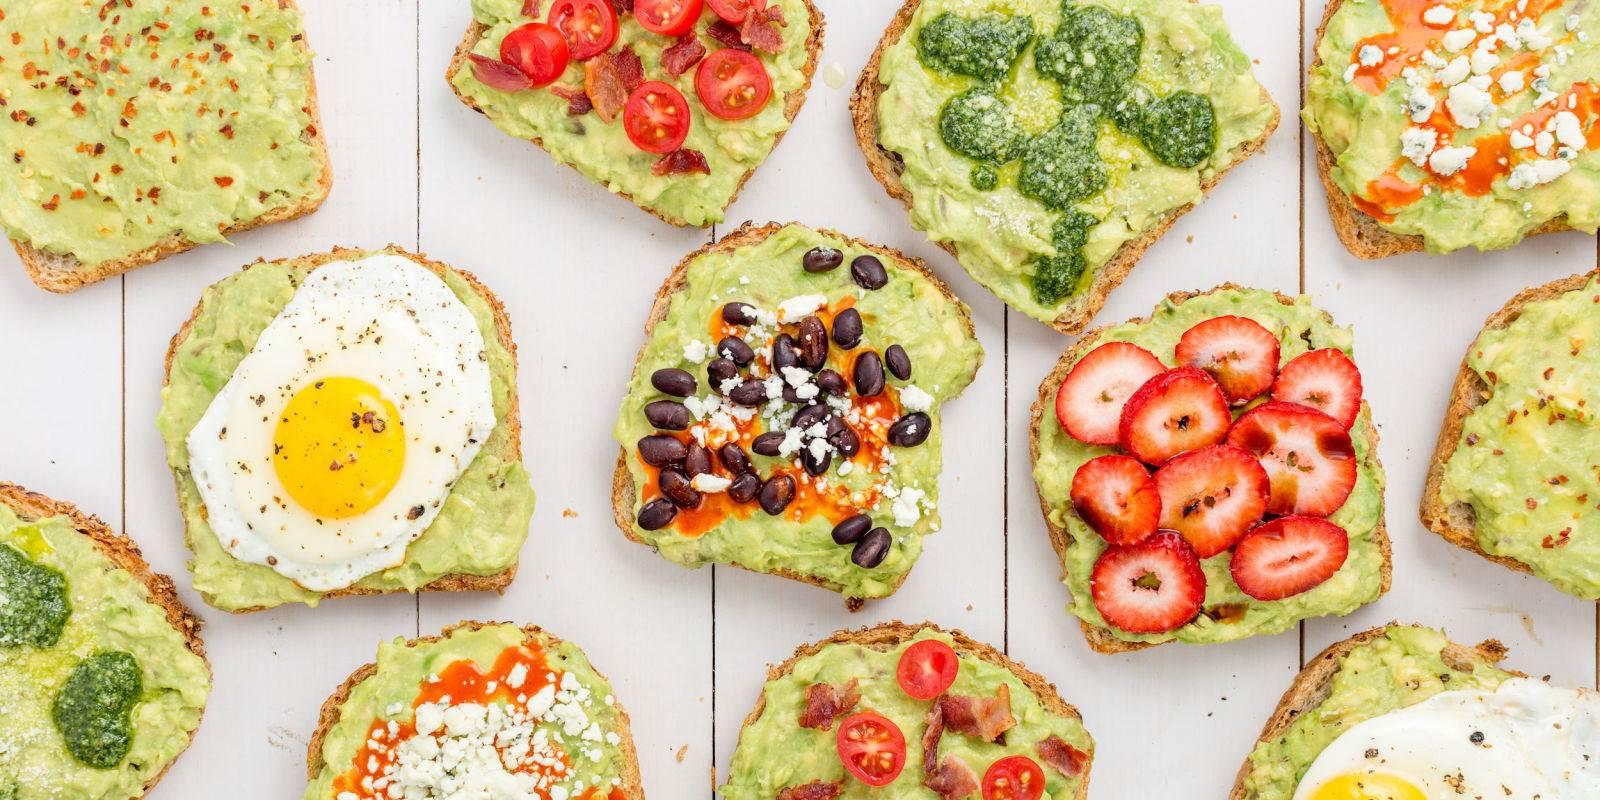 Healthy Delicious Snacks  5 Tasty And Healthy Study Snacks